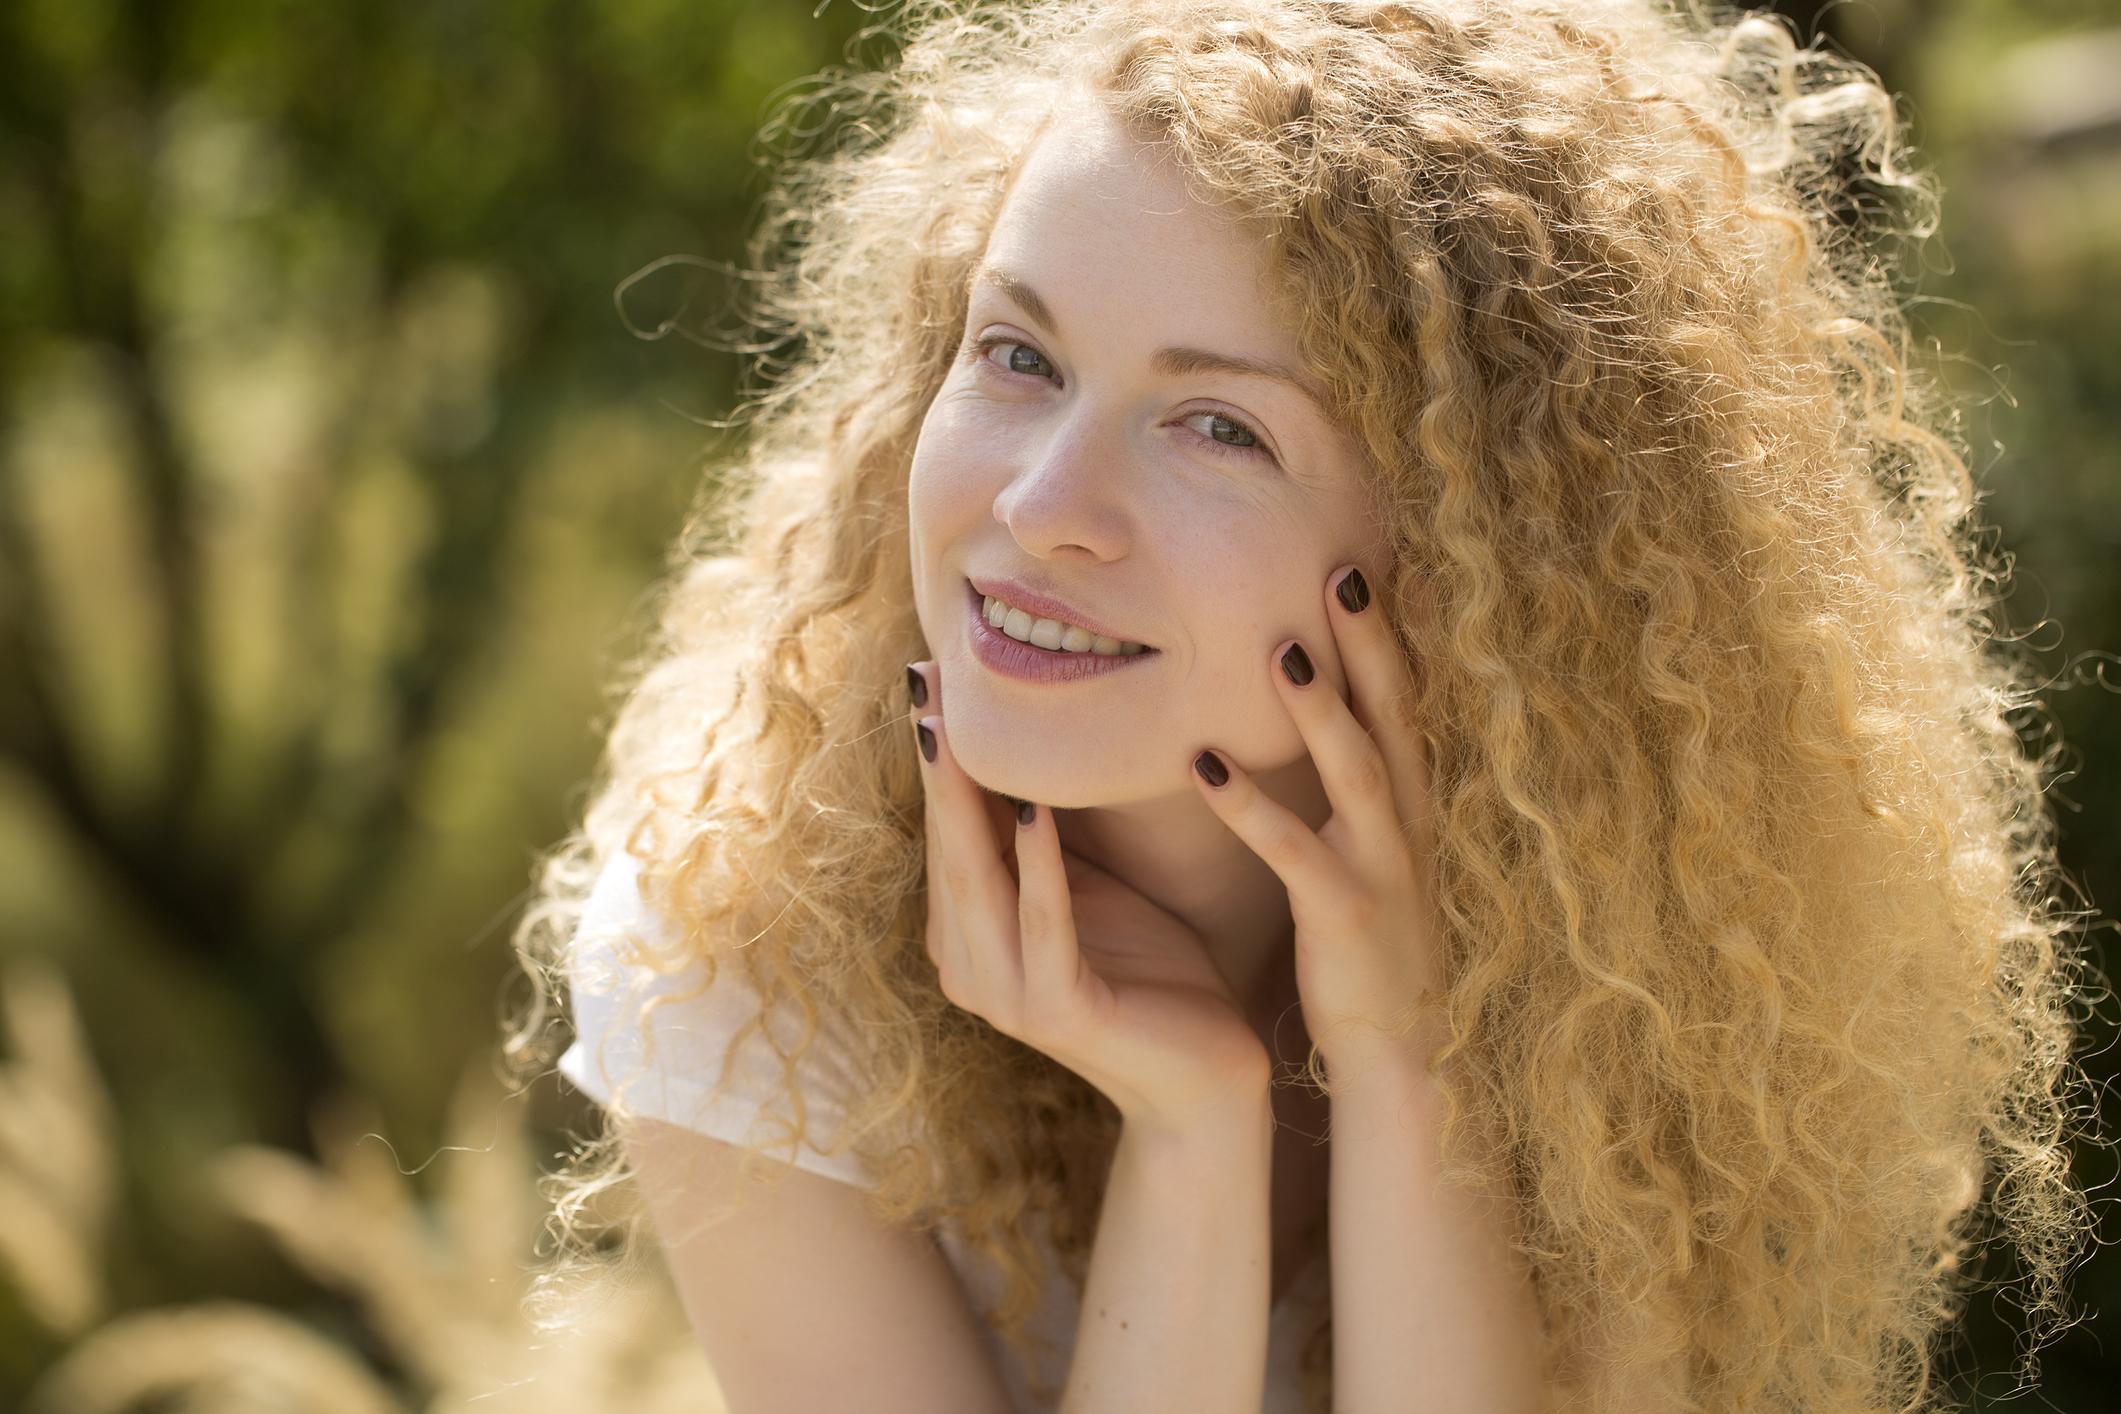 mulher loira de cabelo crespo solto